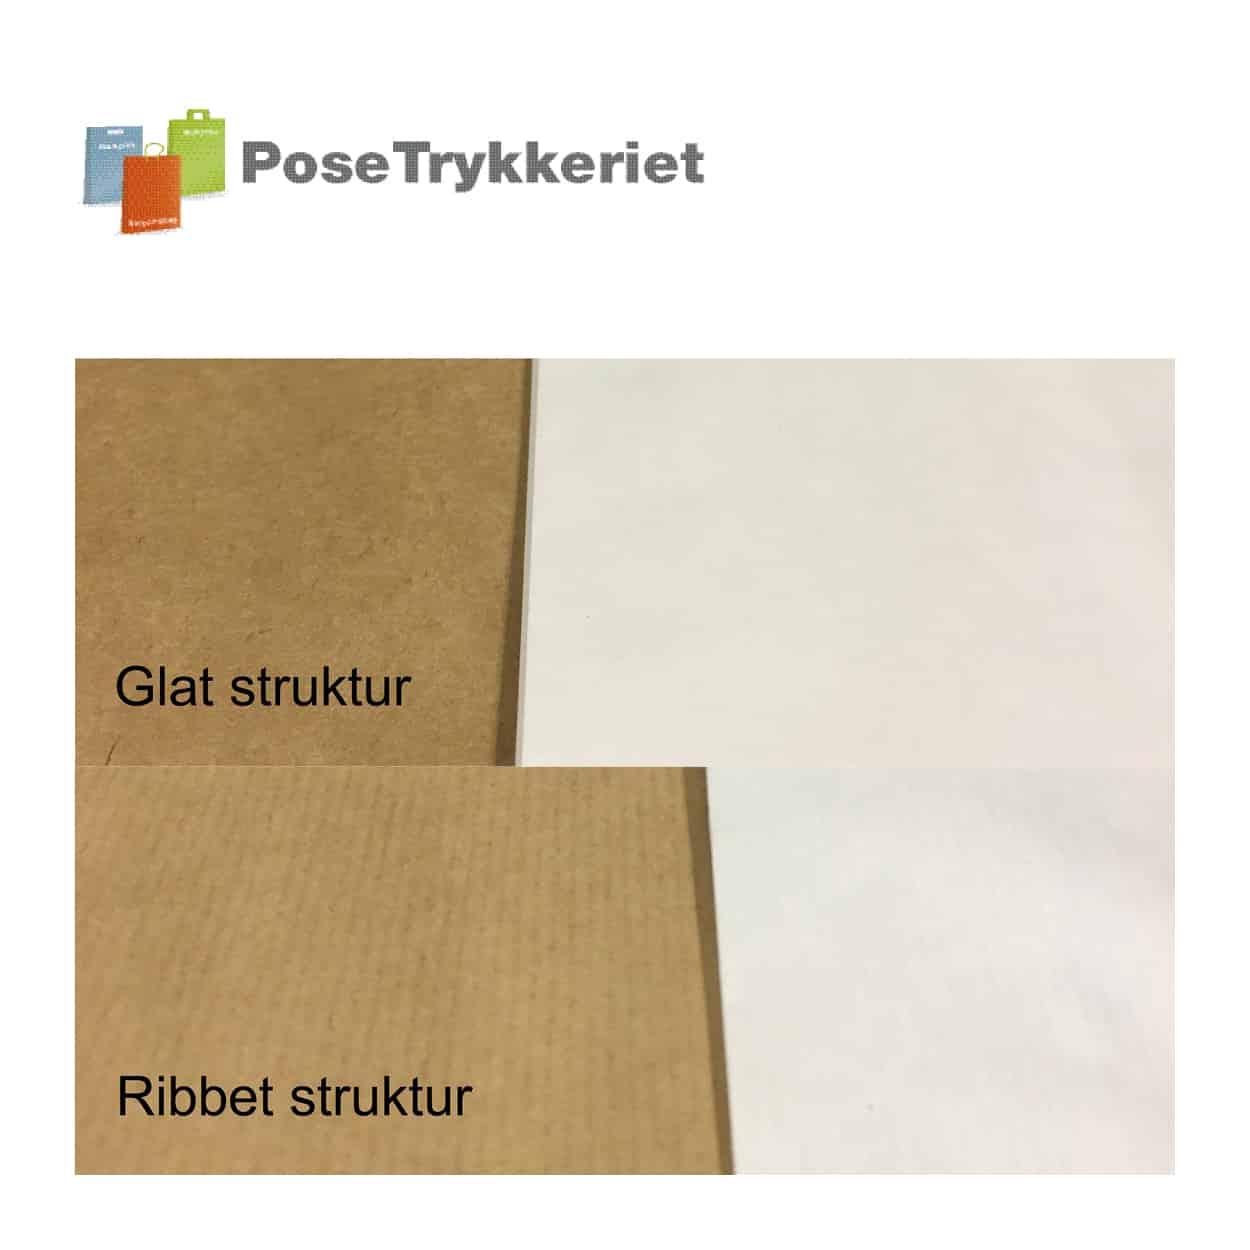 Glat og ribbet struktur, kraftpapir poser. Posetrykkeriet.dk